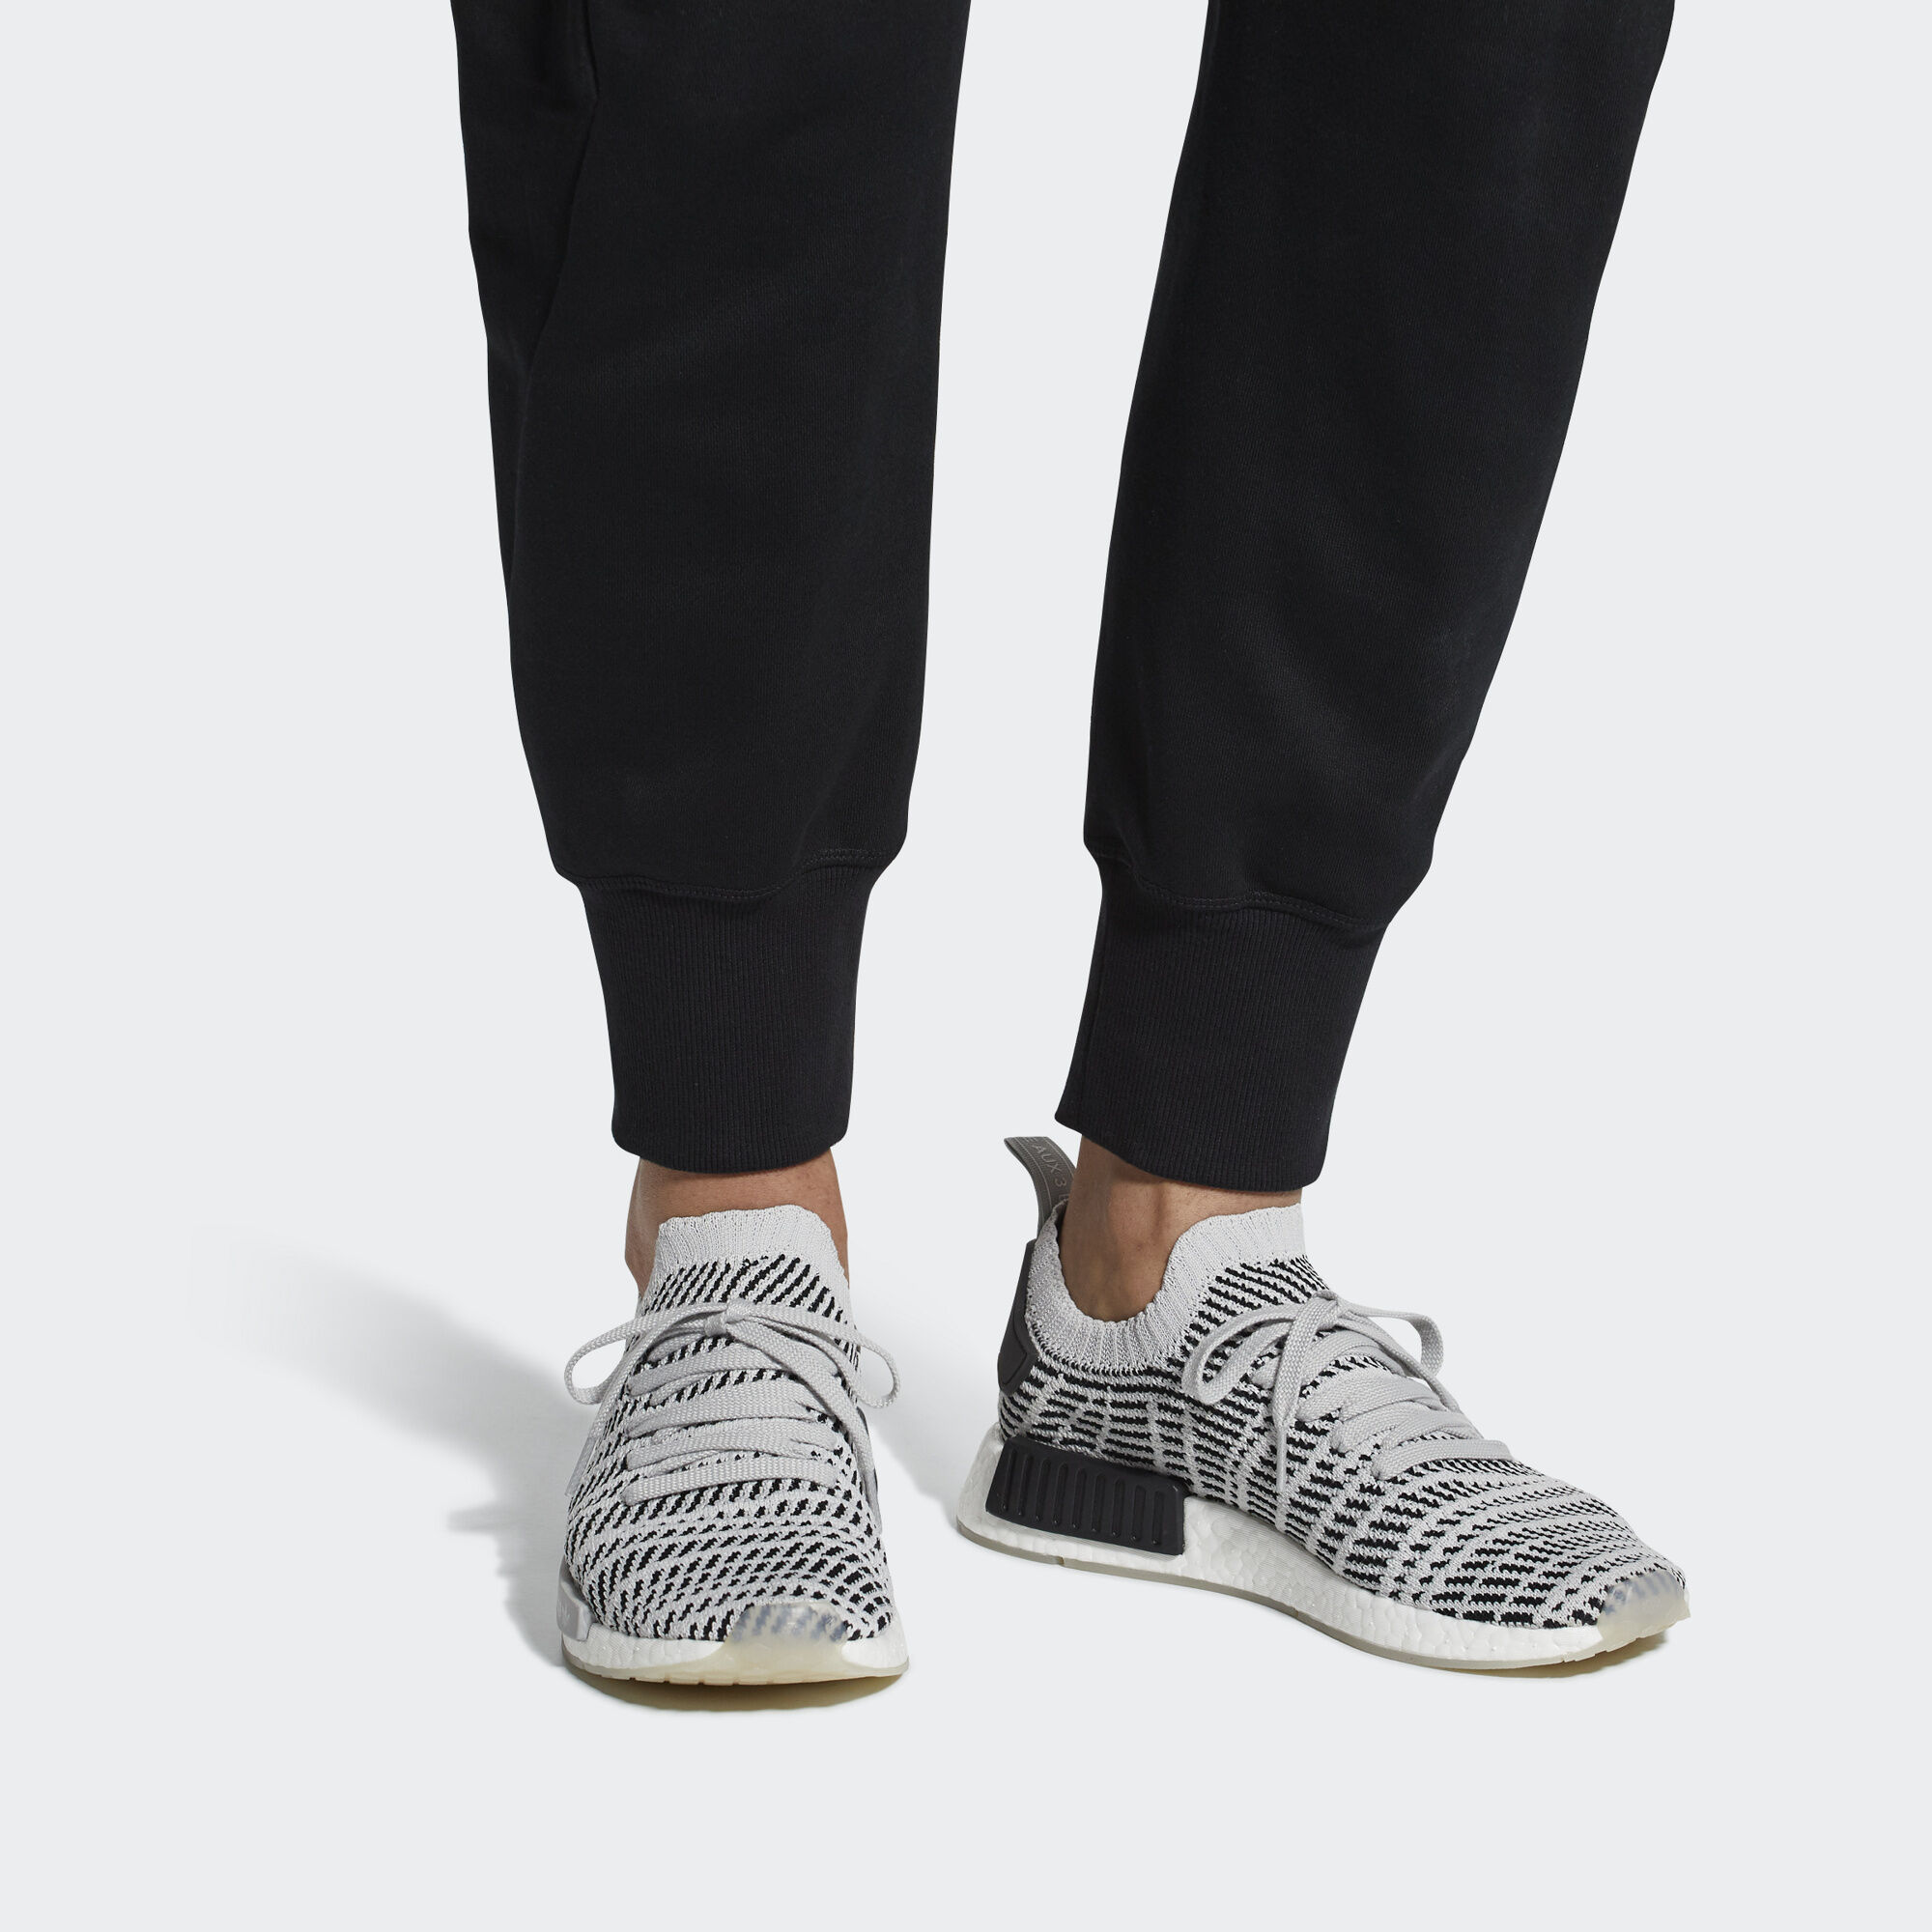 on sale 5cf23 05c06 adidas NMDR1 STLT Primeknit Schuh - Rot  adidas Austria